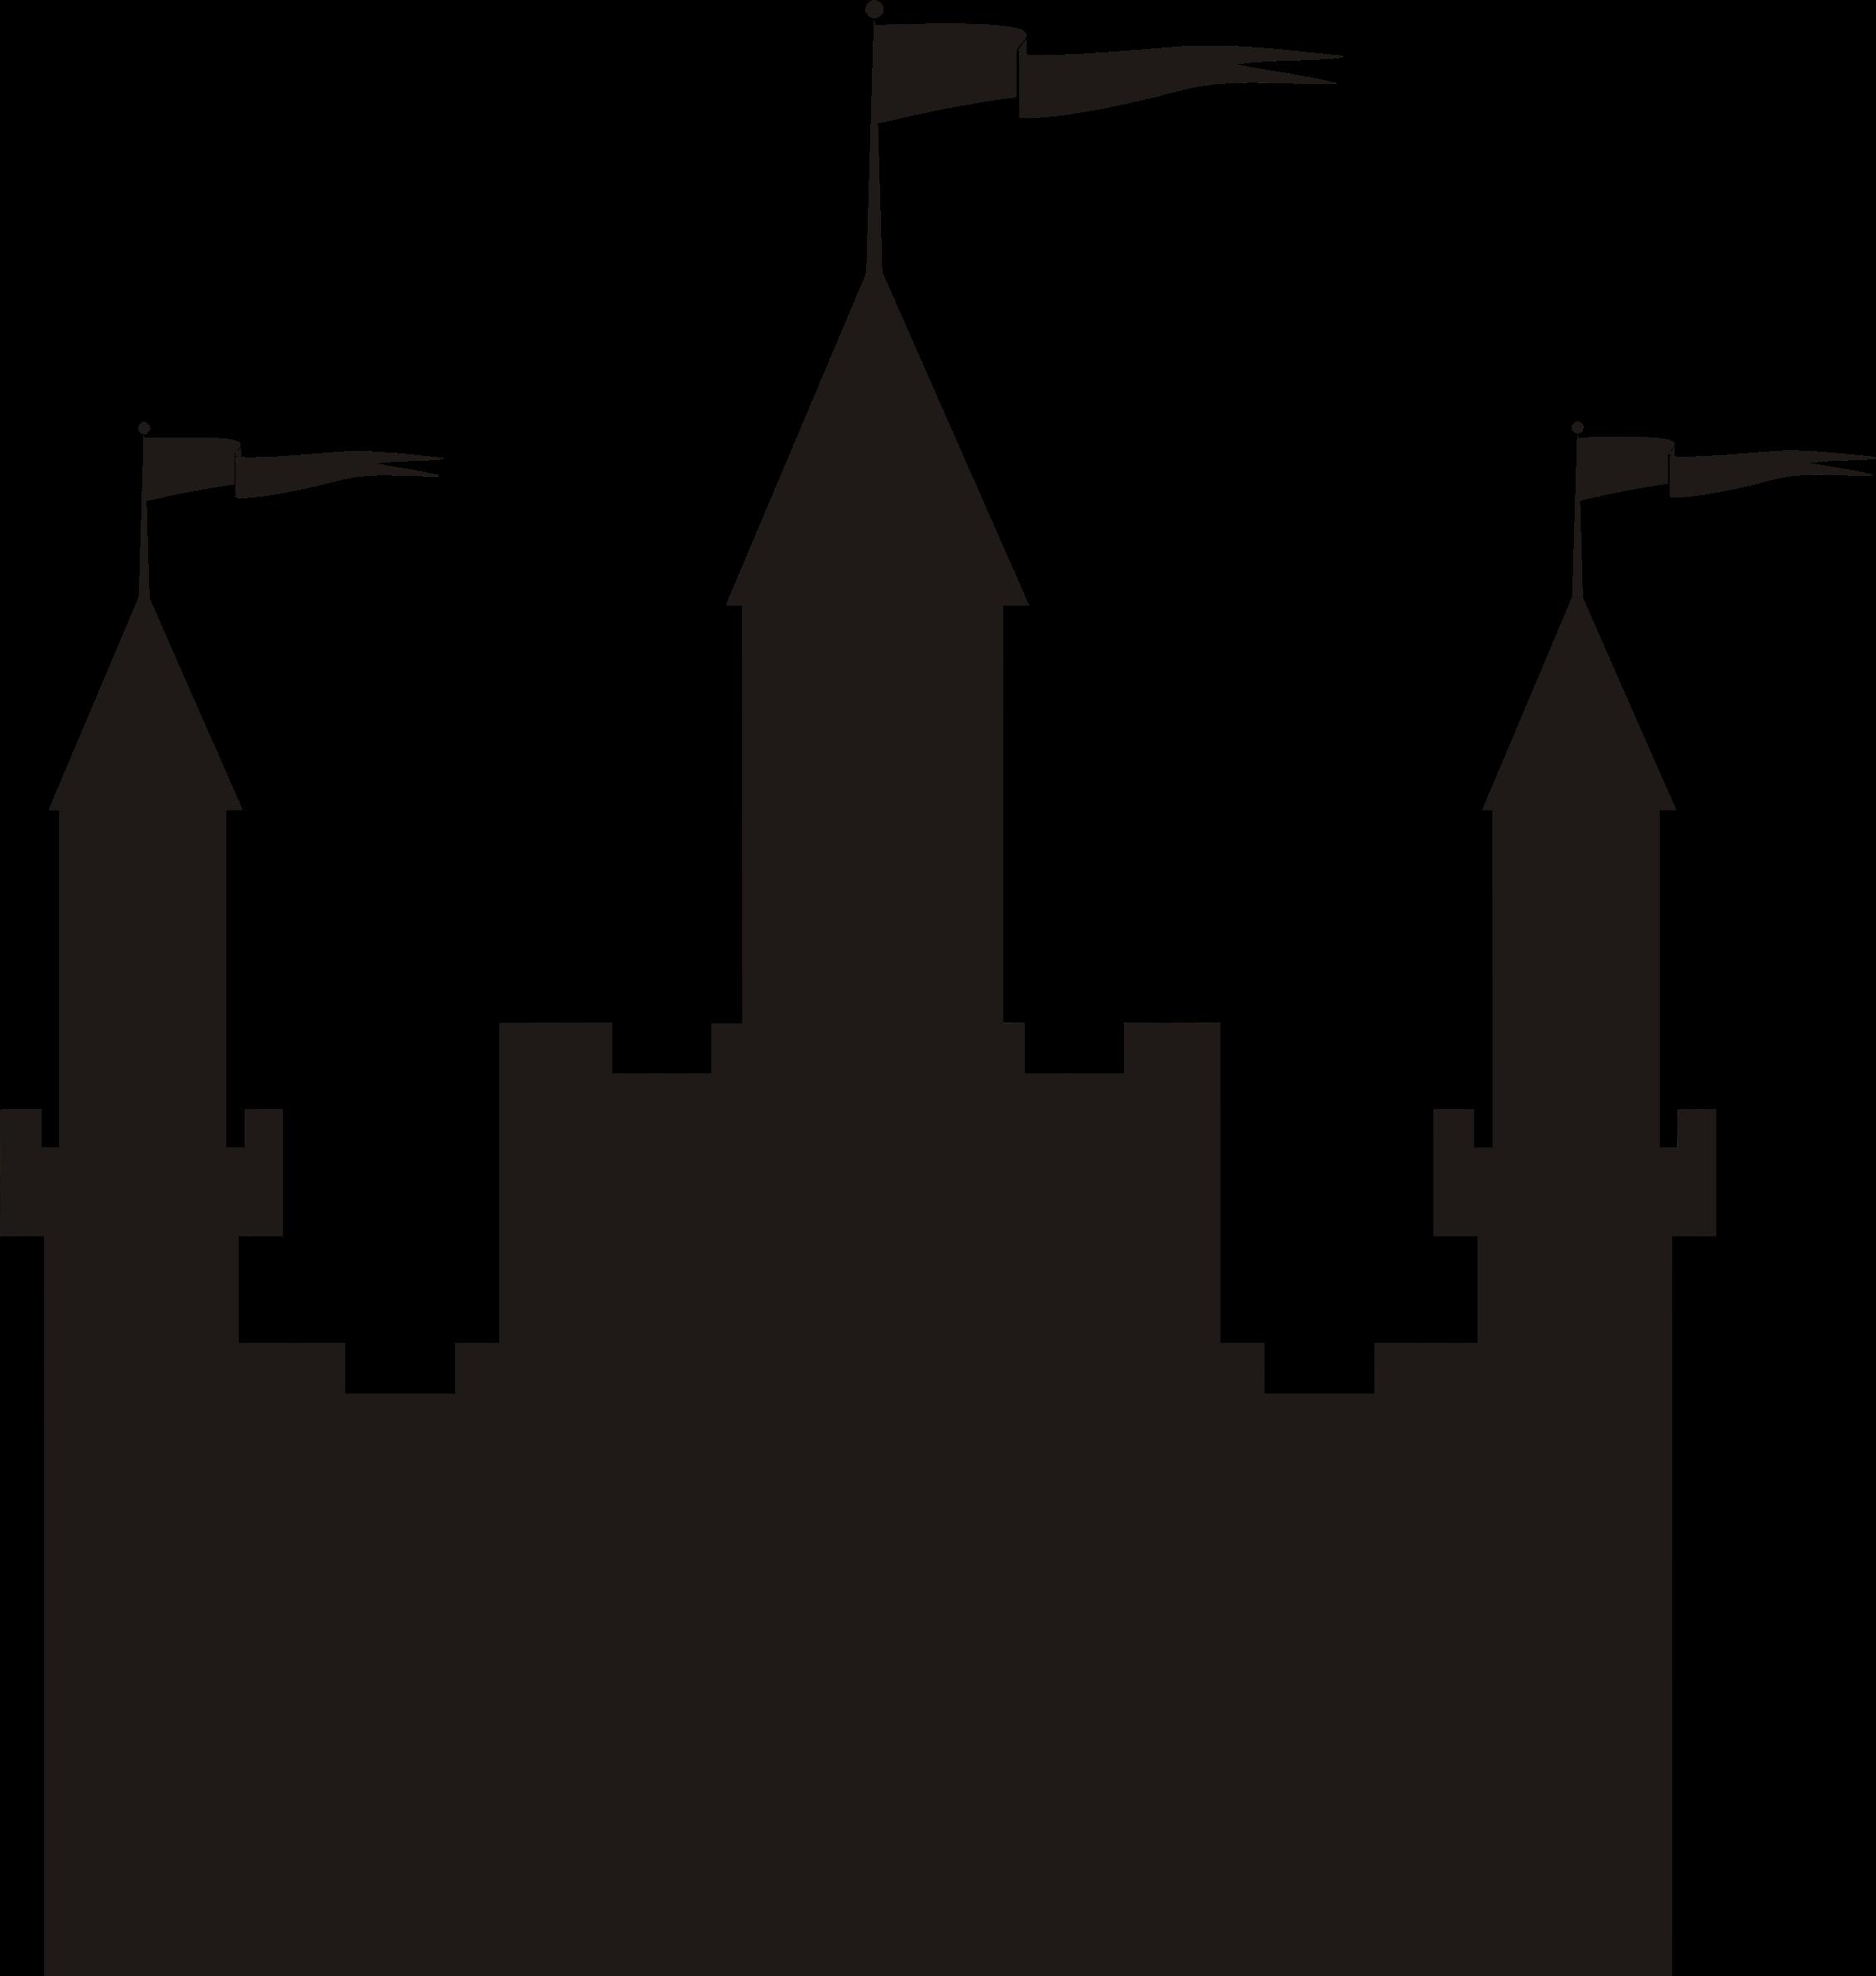 2255x2375 Clipart Castle Silhouette Collection